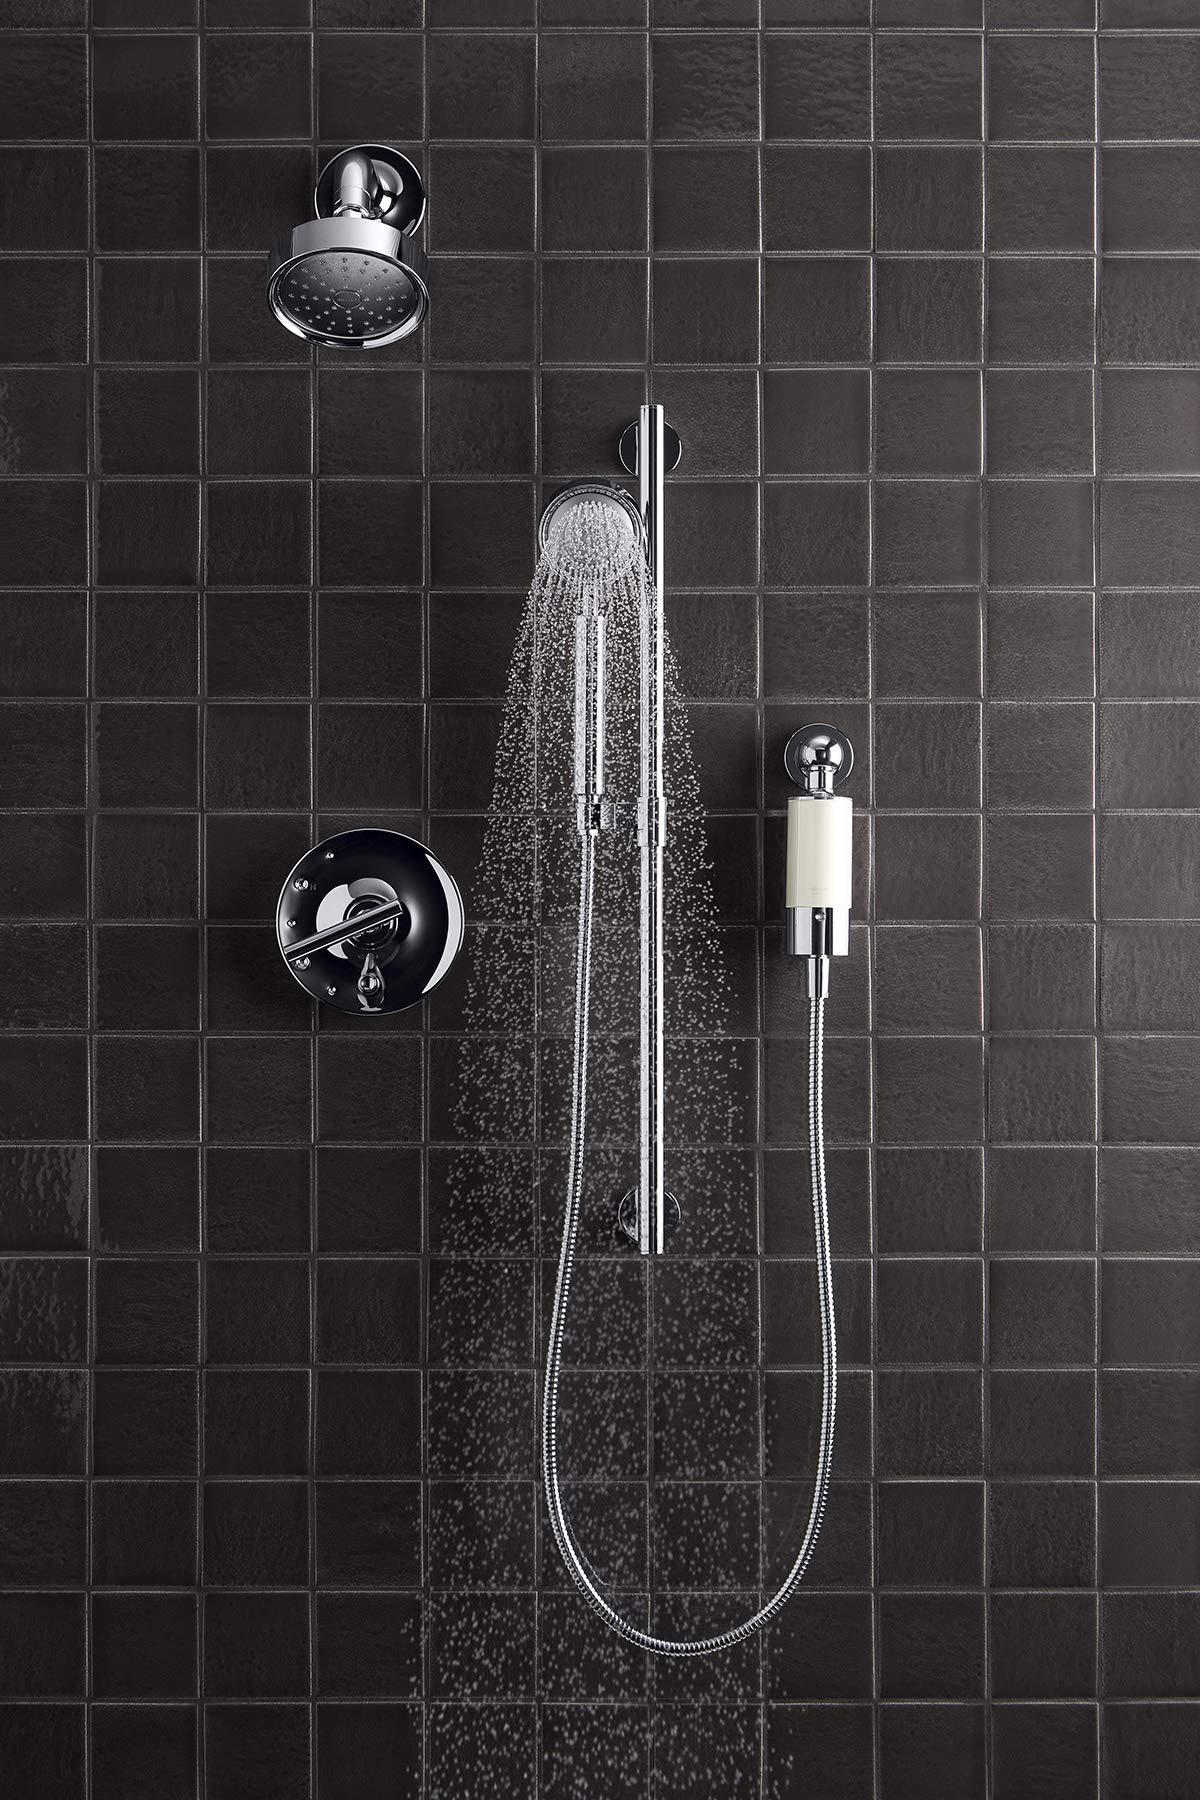 Kohler 30646-CP Aquifer Shower Water Filtration System, Reduce Chlorine and Odor, Includes Filter Replacement by Kohler (Image #4)